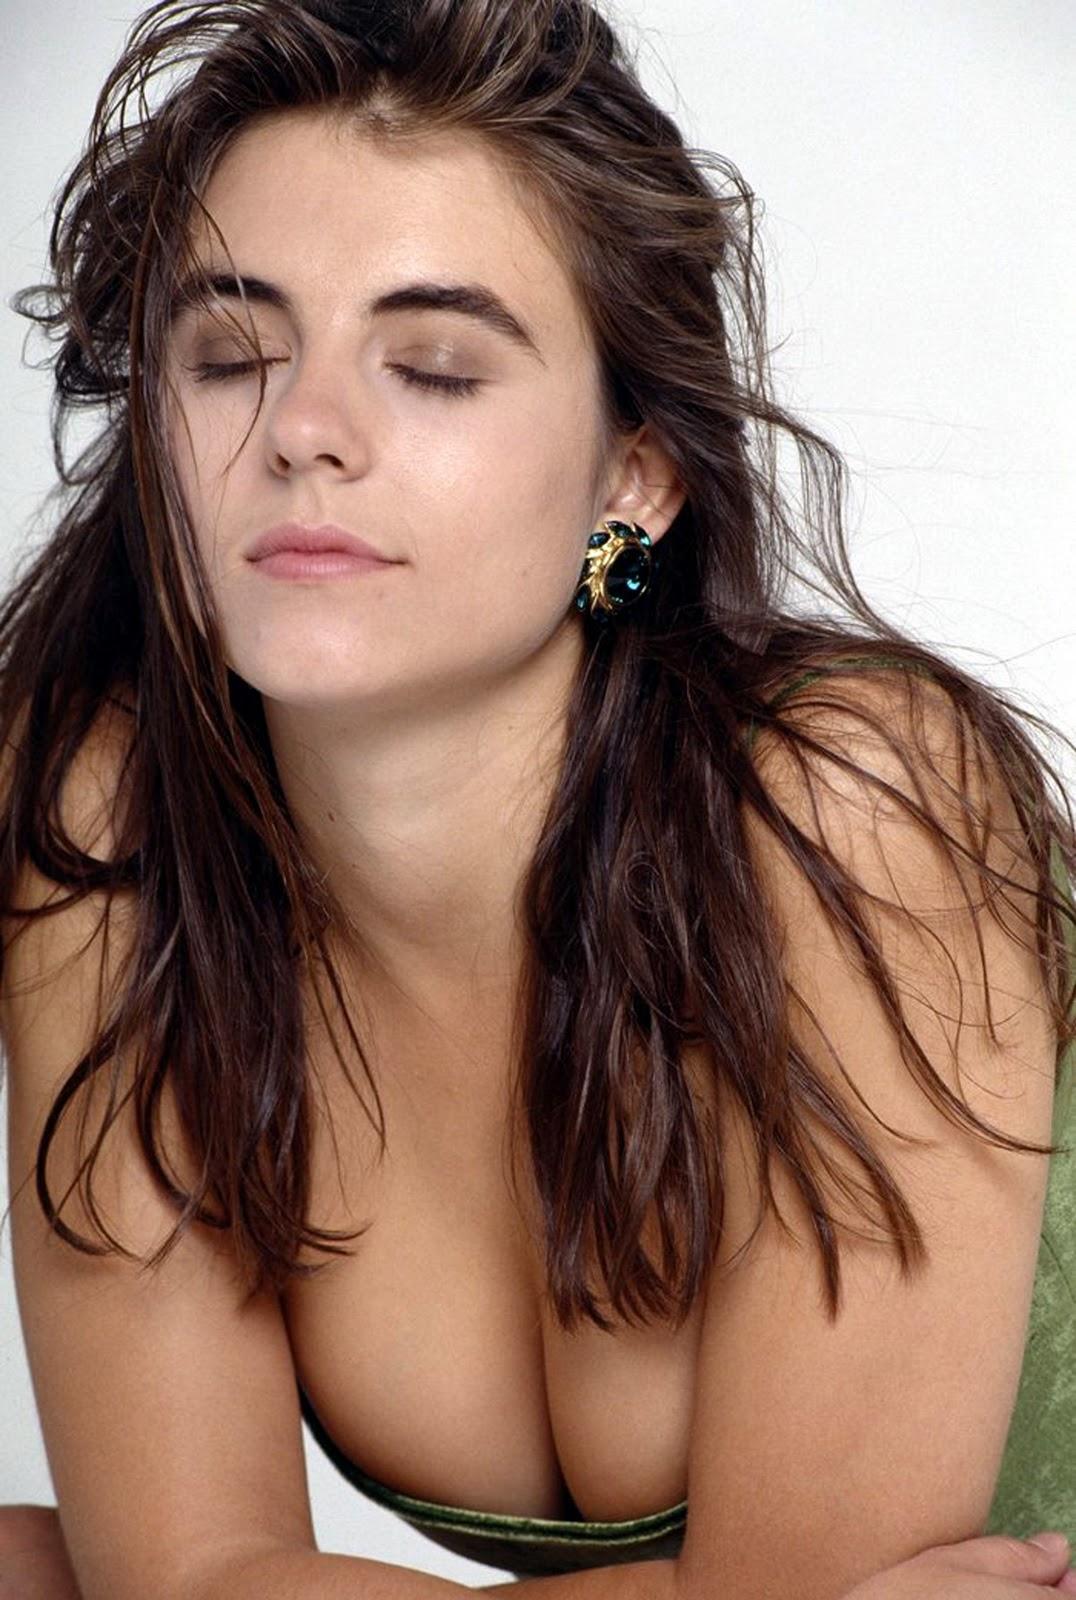 Junge Liz Hurley nackt, Junges Mädchen filmt nackten Babysitter